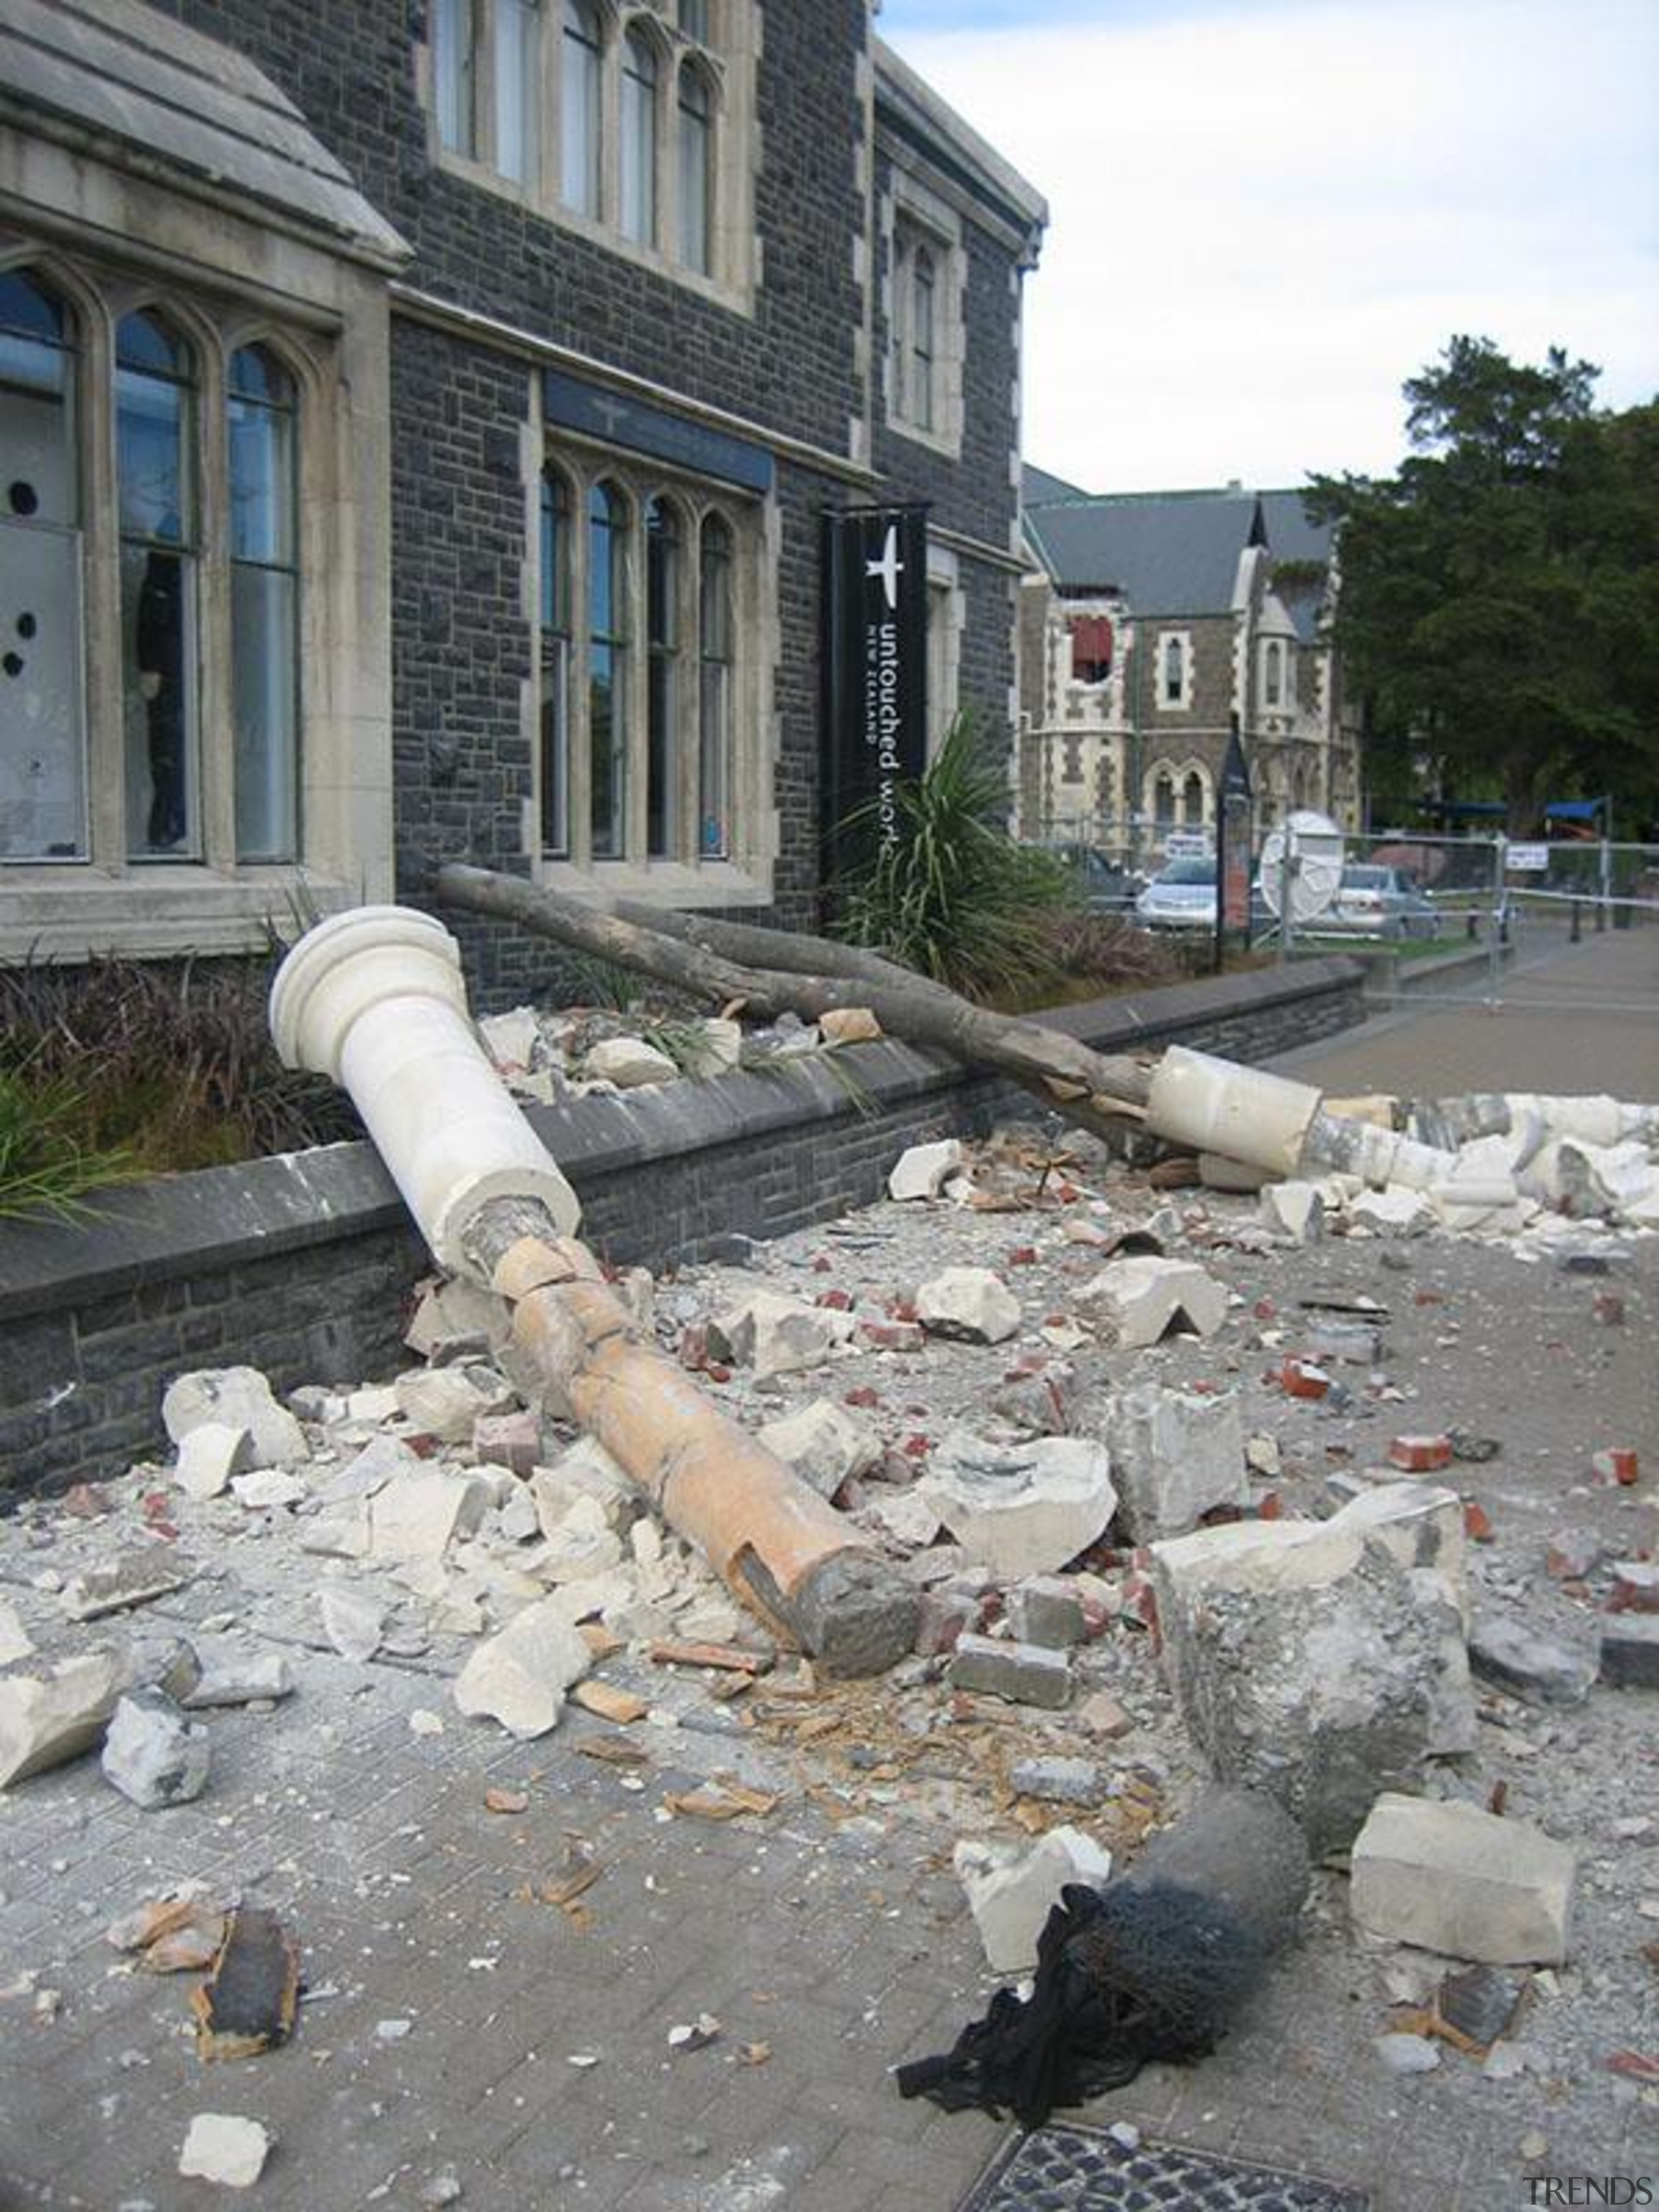 NOMINEERegistry Building (1 of 4) - Hays Commercial road surface, rubble, walkway, gray